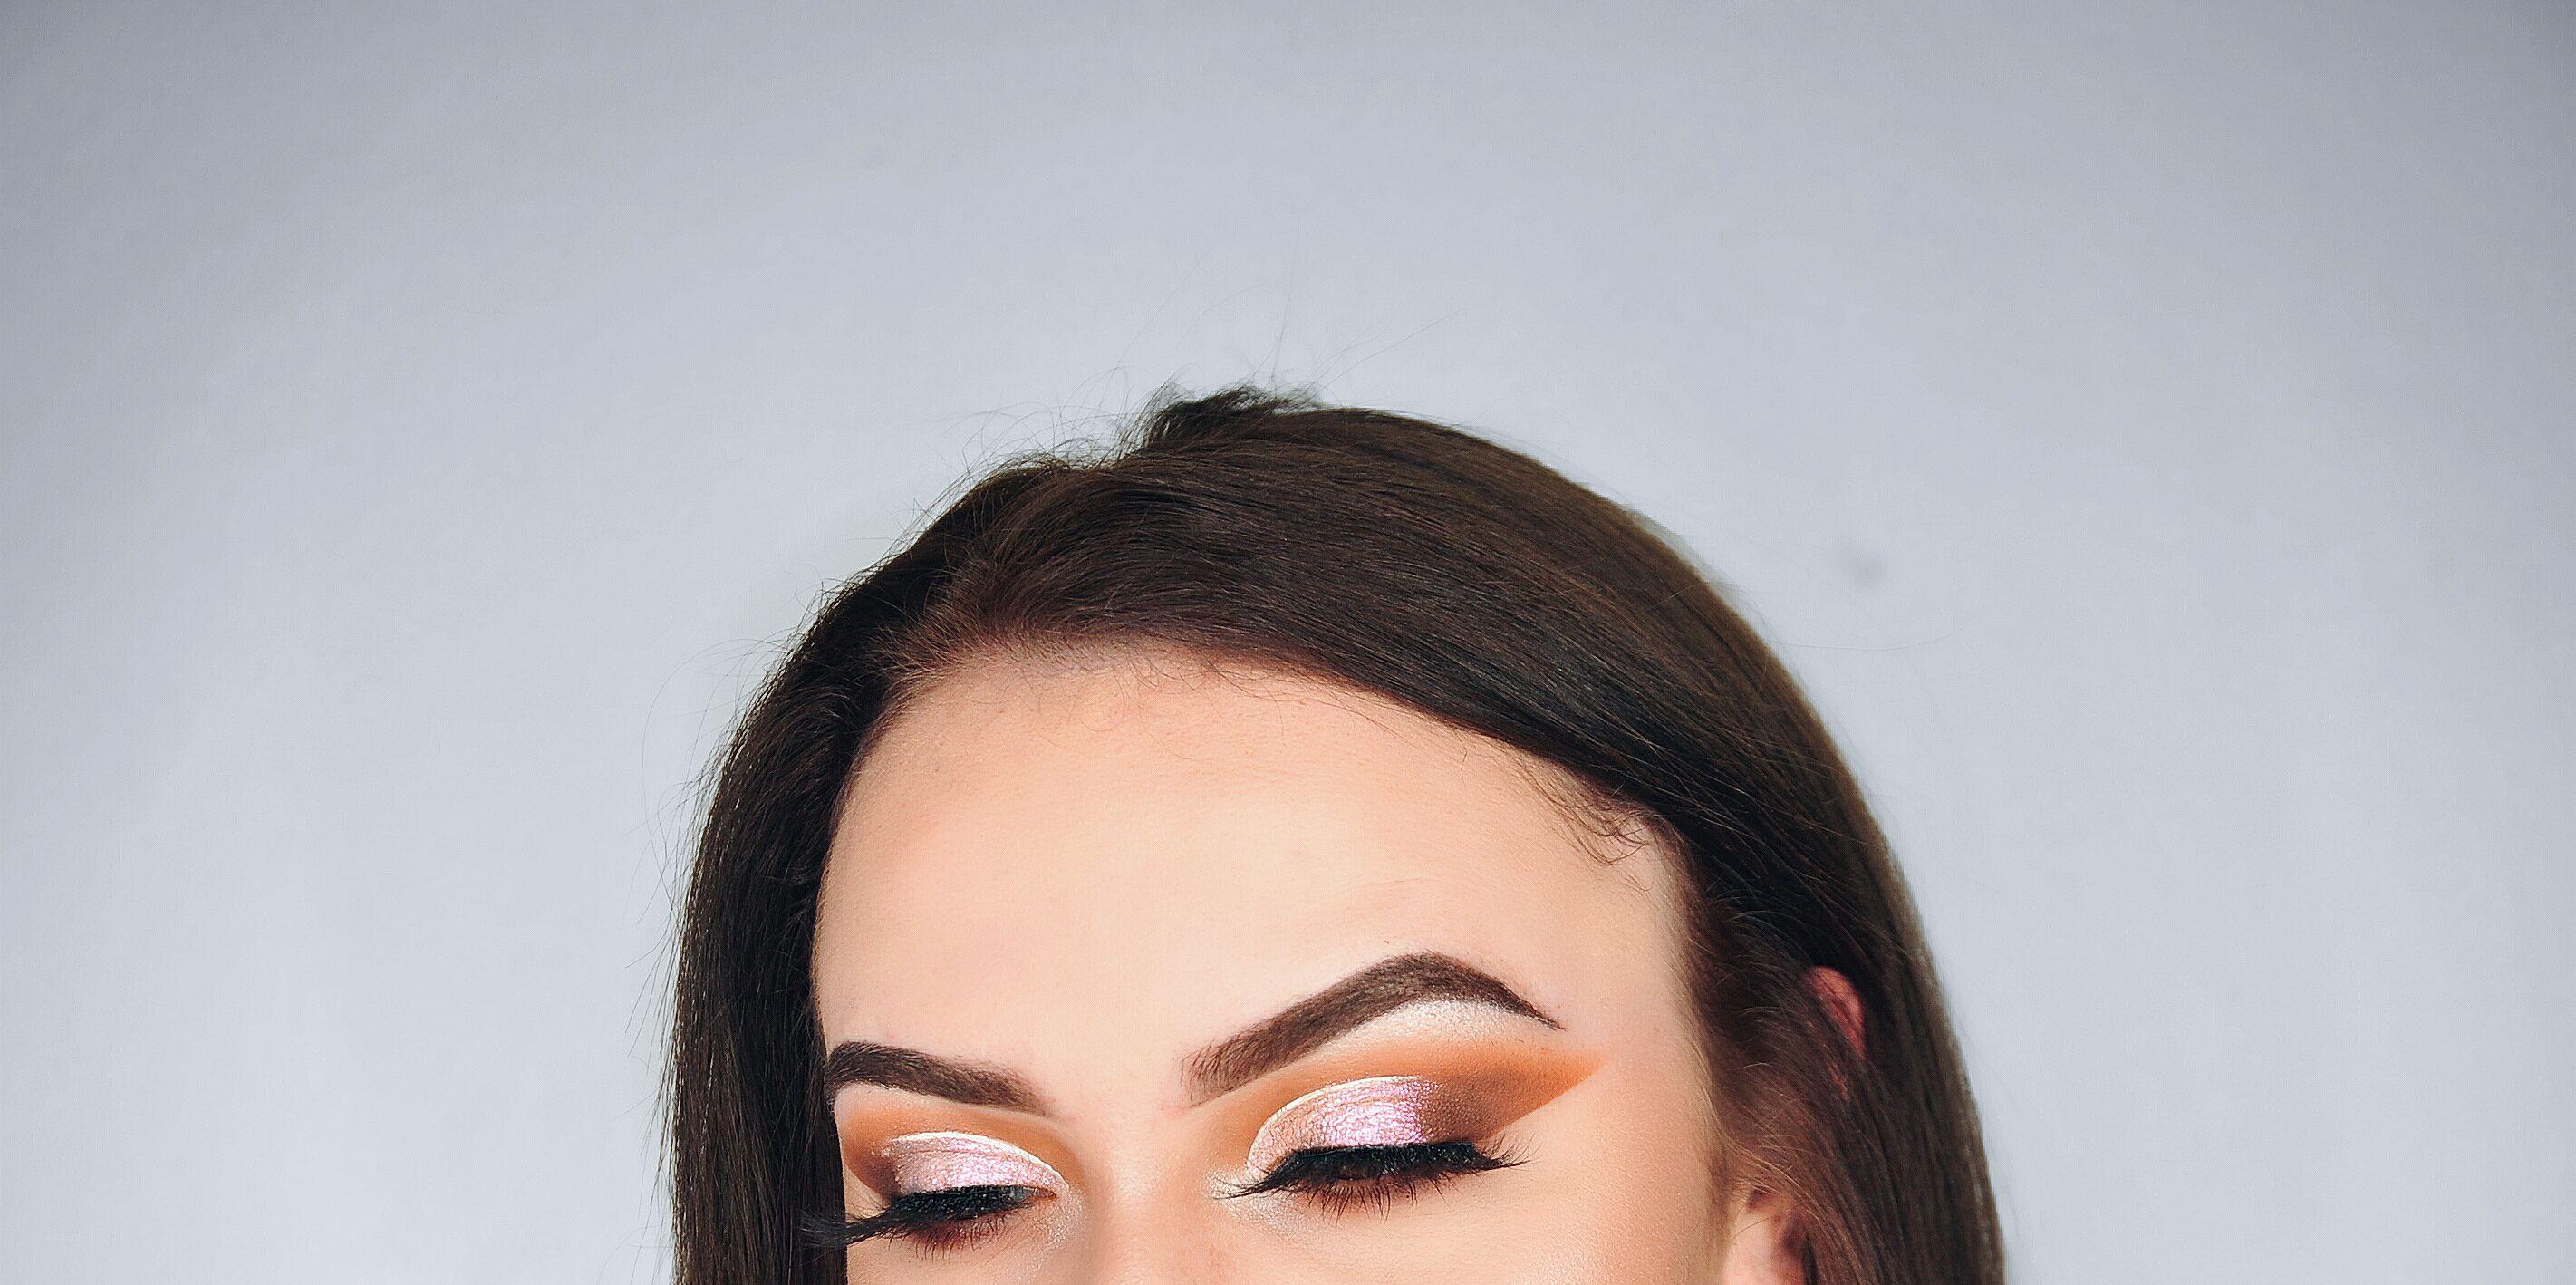 #makeup #mua #makeuplover #pink #orange #eyes #eyebrowsonfleek #falselashes #abhcosmetics